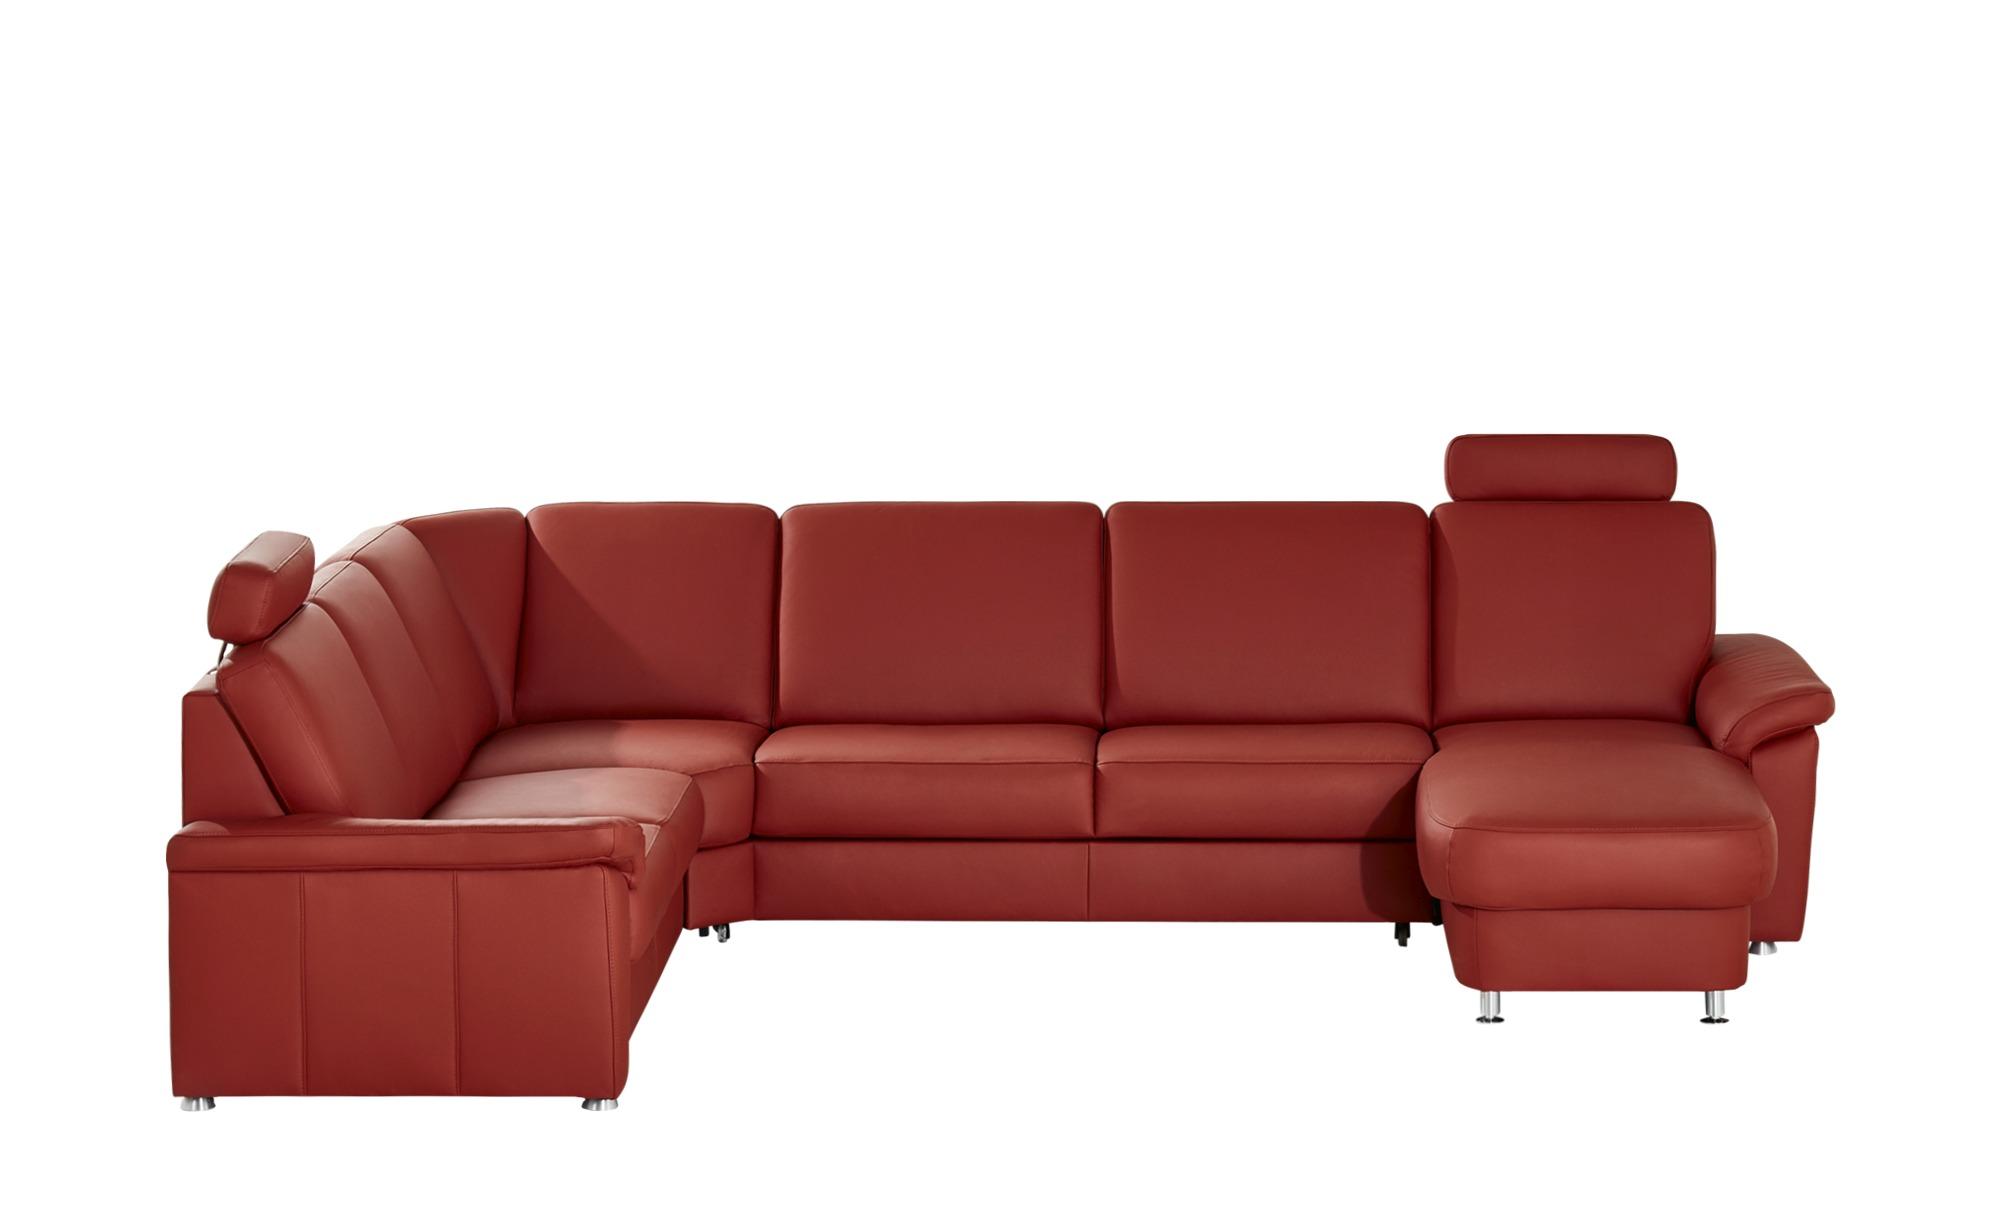 meinSofa Leder-Wohnlandschaft rot - Leder Carolin ¦ rot ¦ Maße (cm): H: 91 Polstermöbel > Sofas > Schlafsofas - Höffner